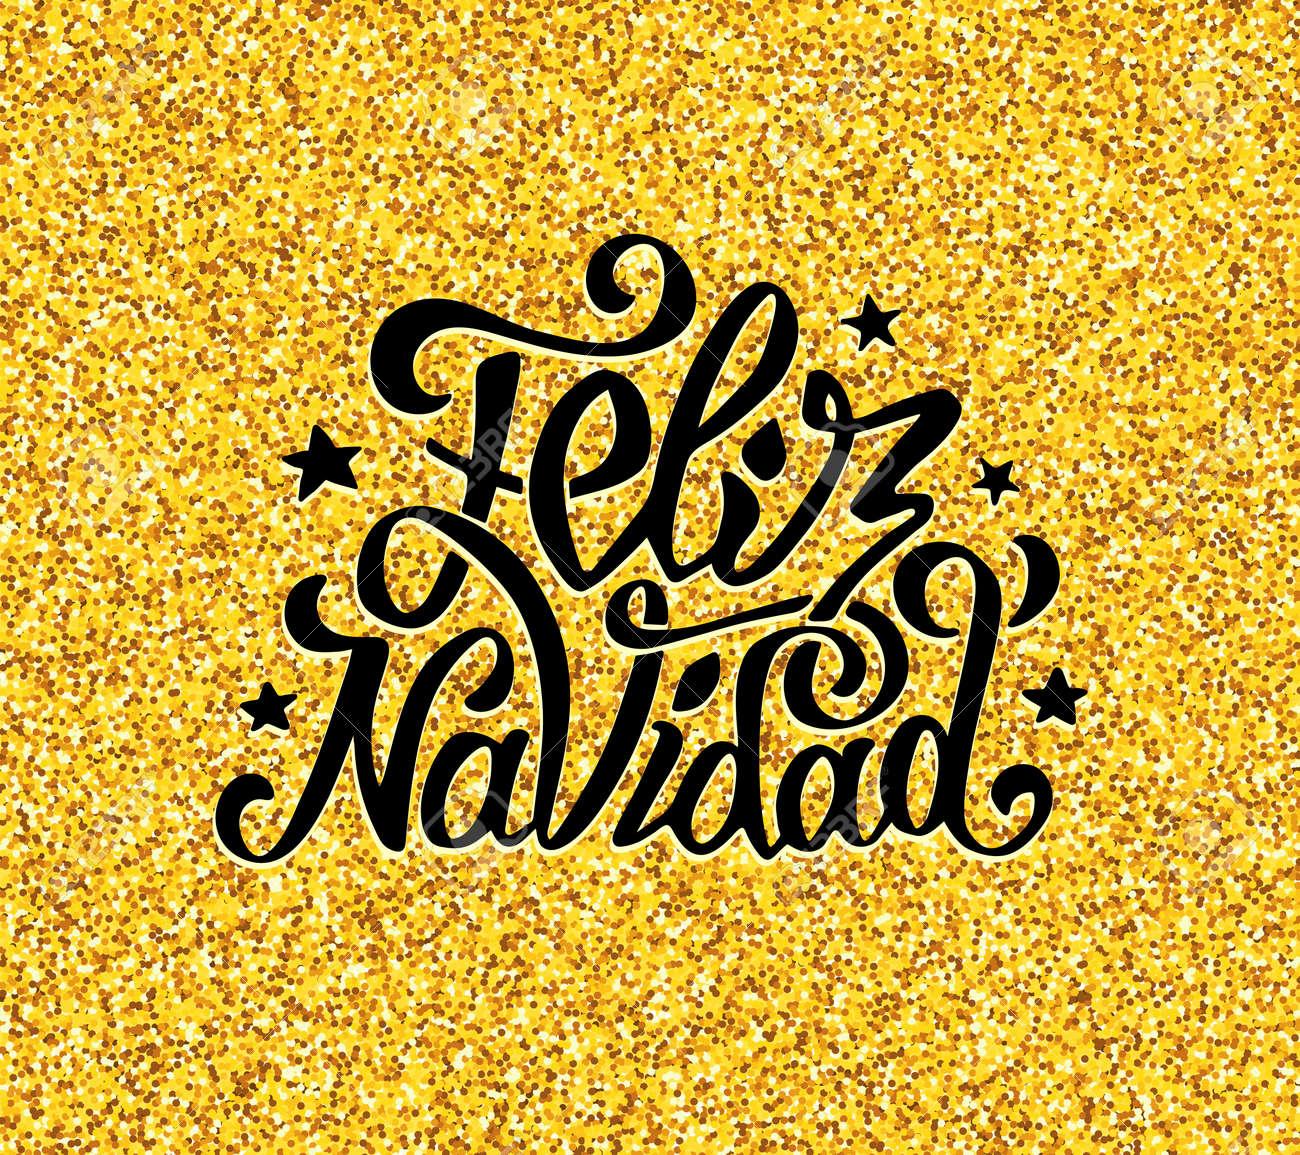 Feliz Navidad Greetings On Golden Confetti Background Merry